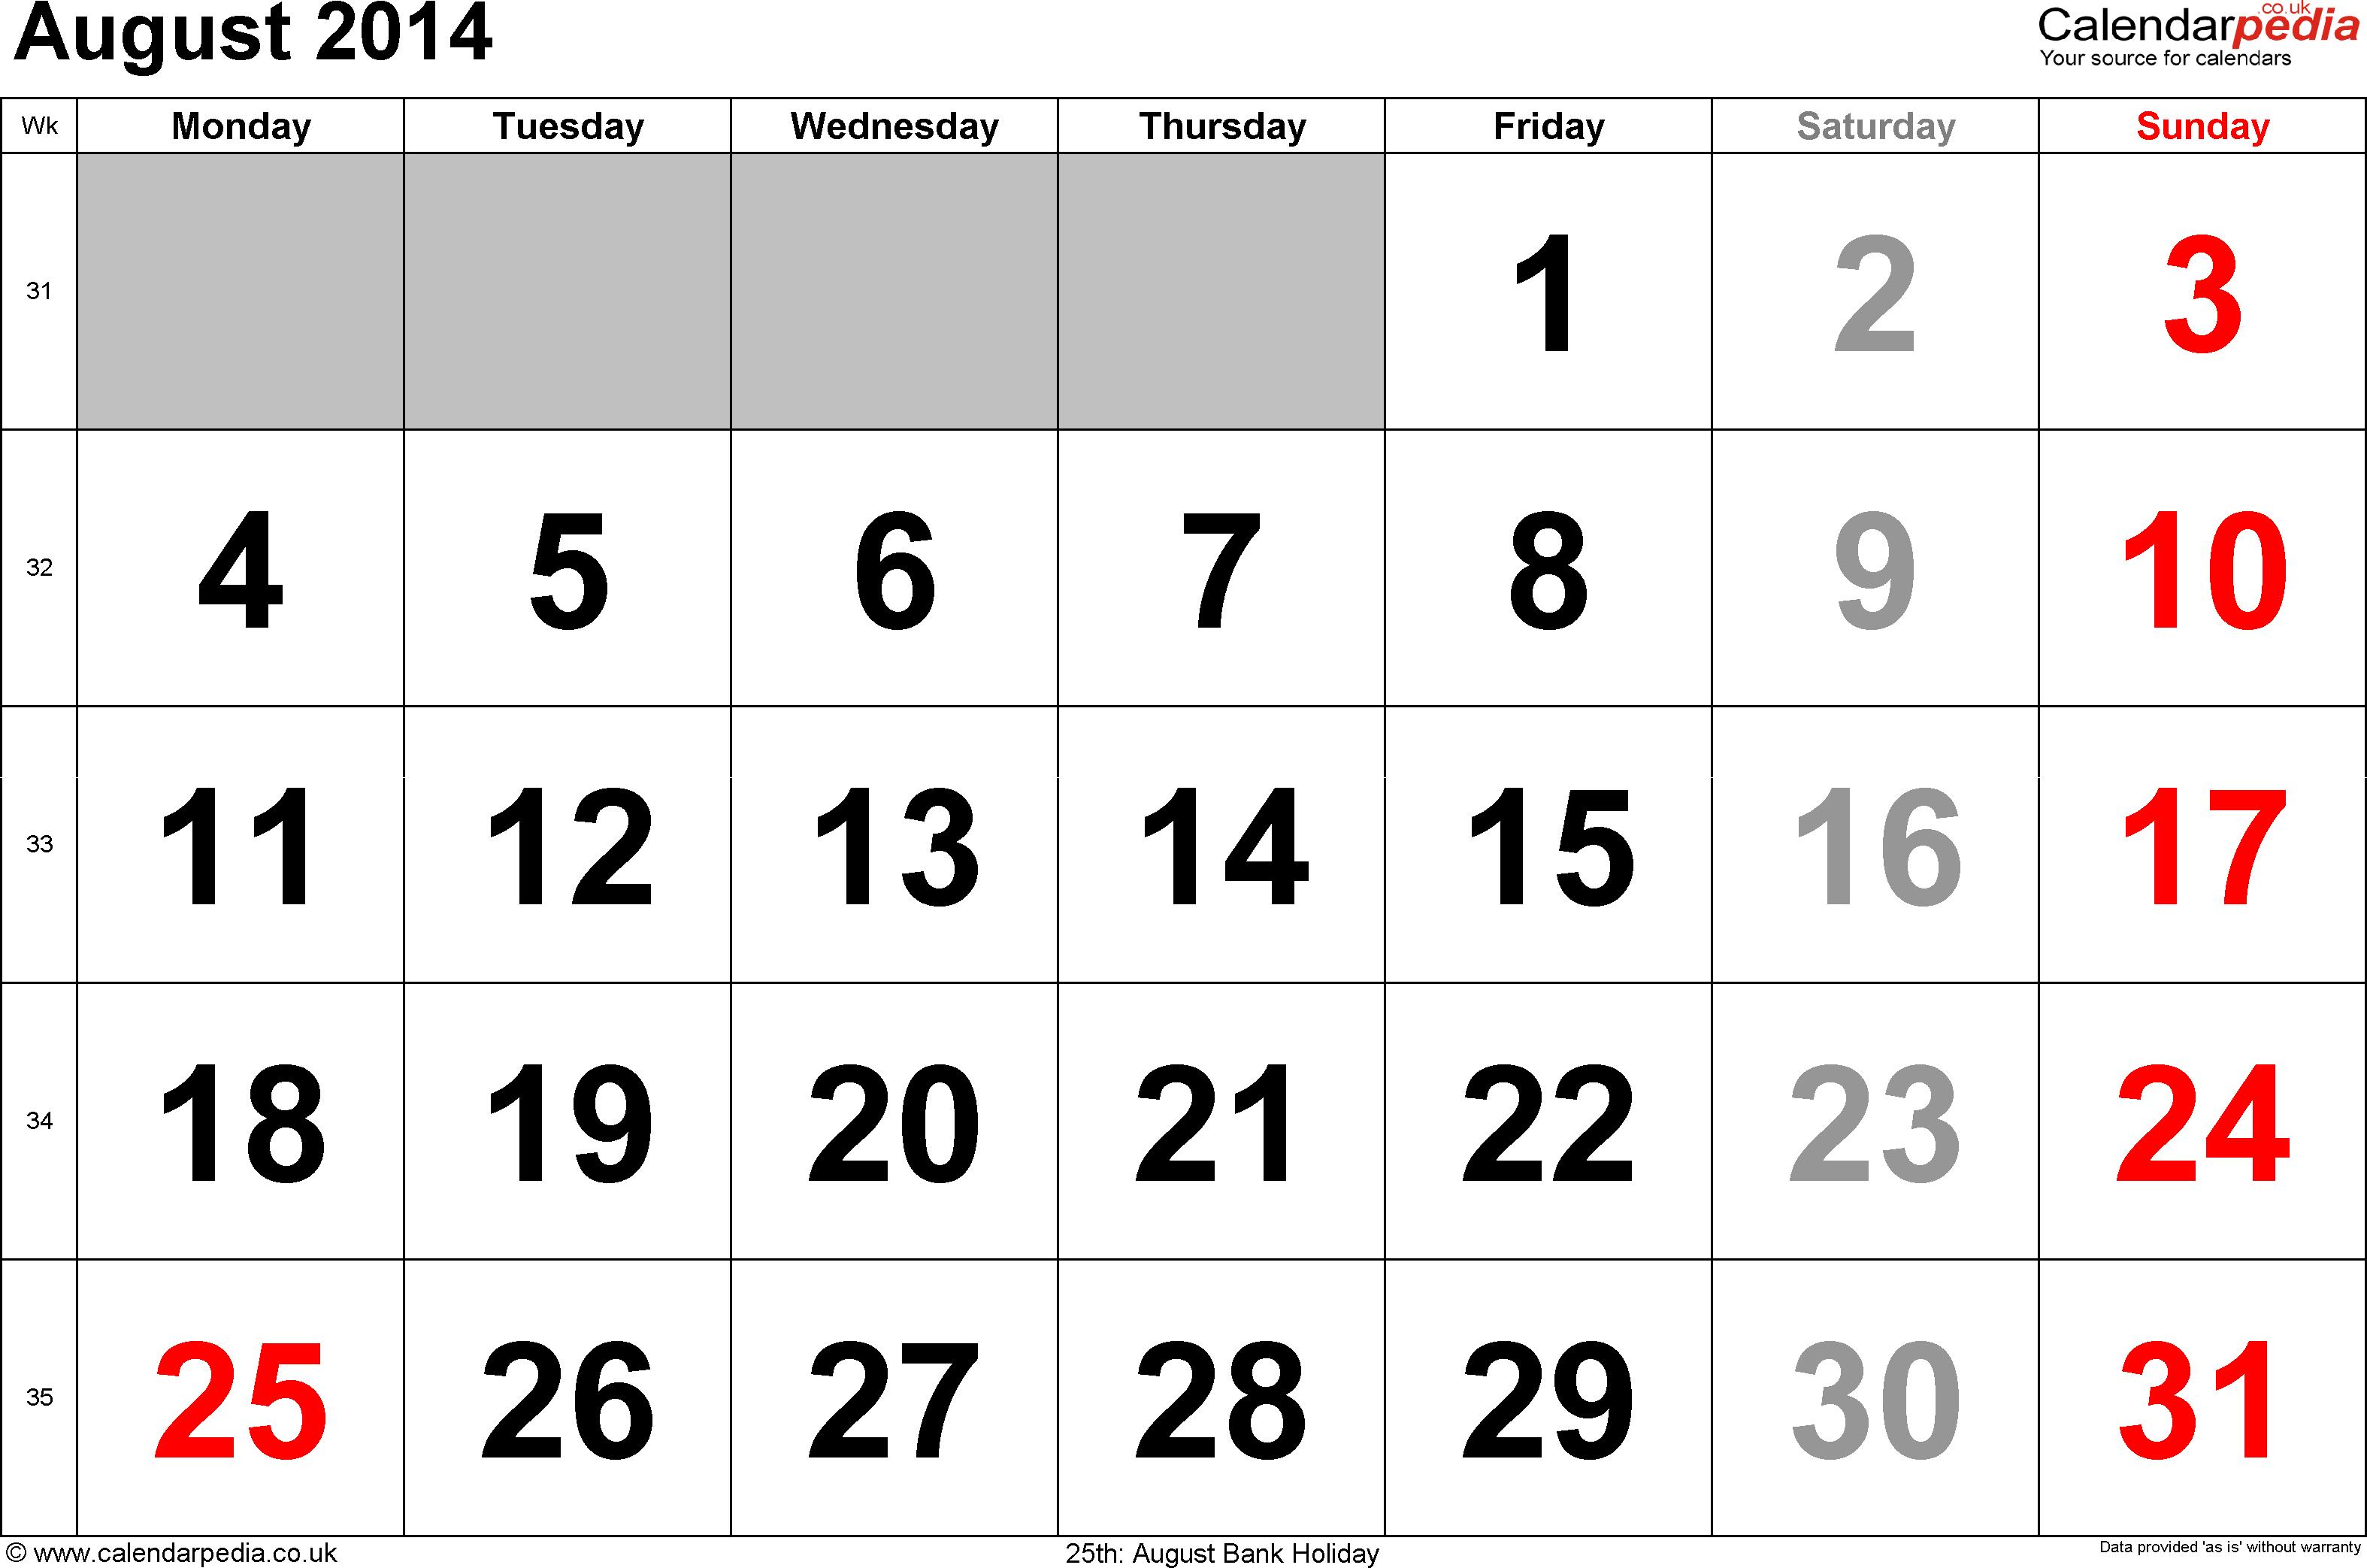 Calendar August 2014 UK, Bank Holidays, Excel/PDF/Word ...